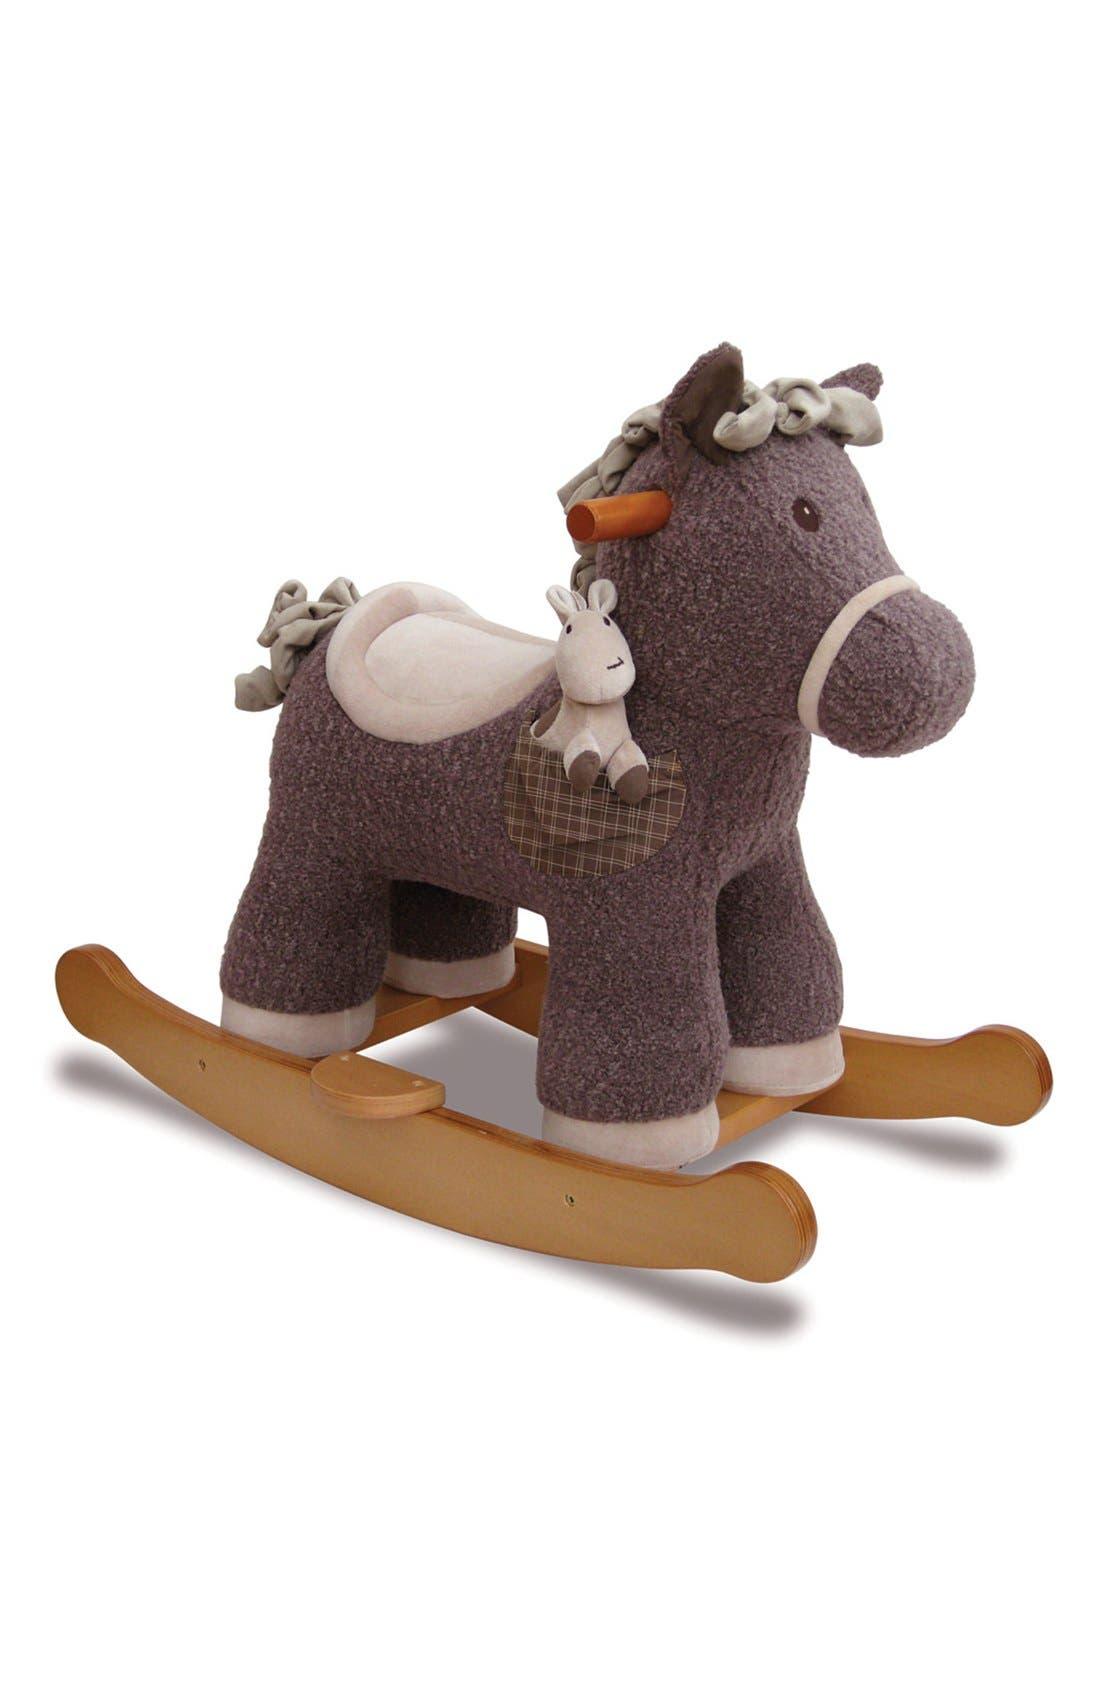 Rocking Horse & Stuffed Animal,                             Main thumbnail 1, color,                             200